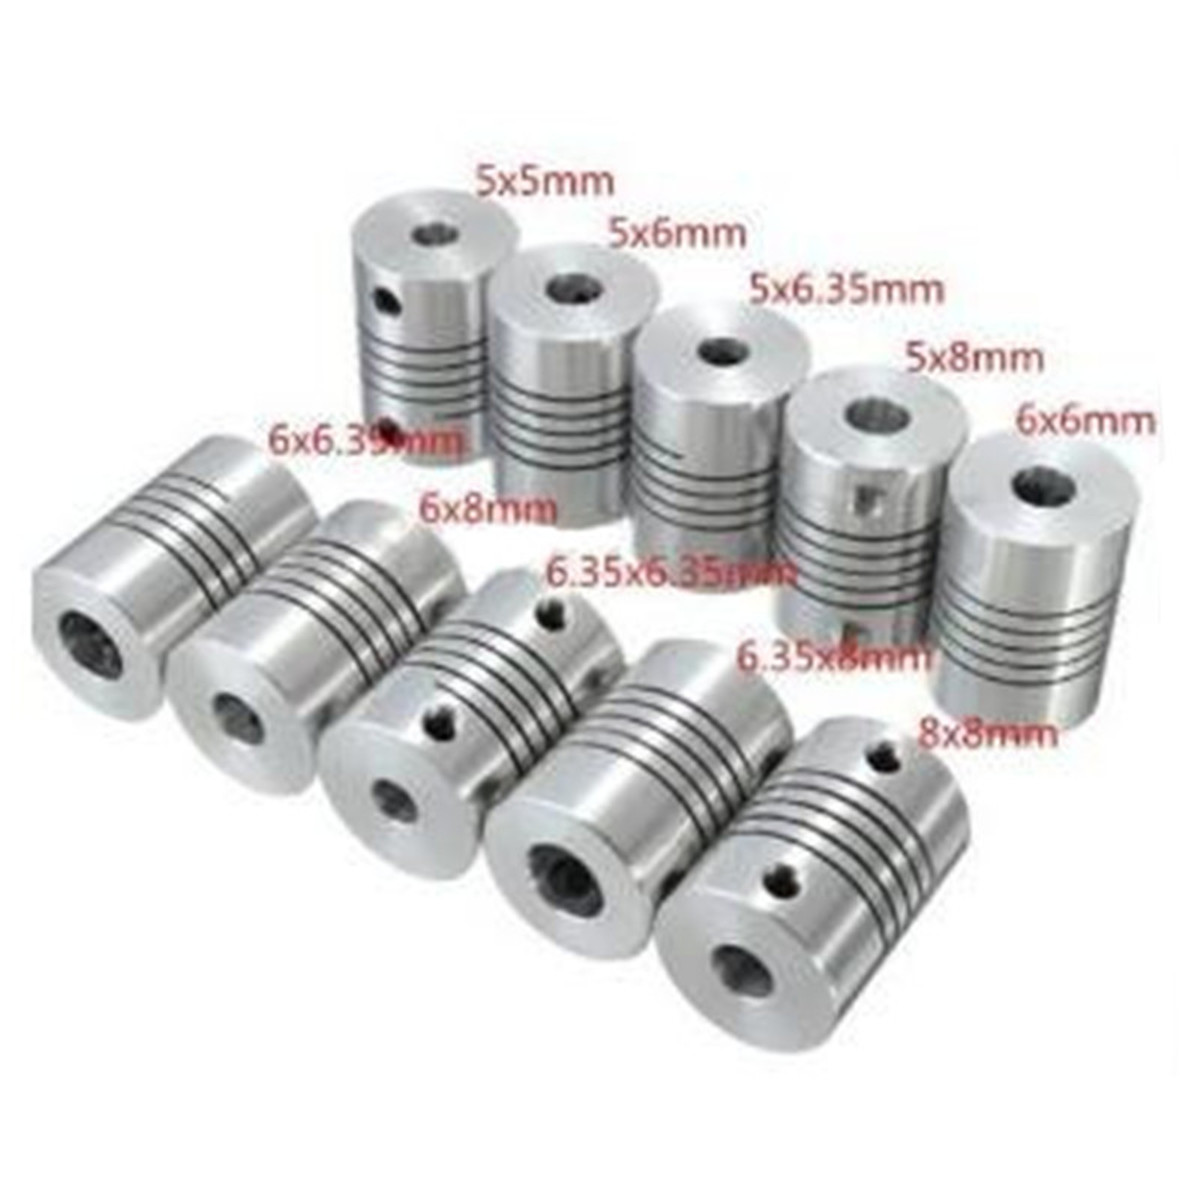 6.35//8mm Flexible Shaft Coupling Rigid CNC Stepper Motor Coupler Connector